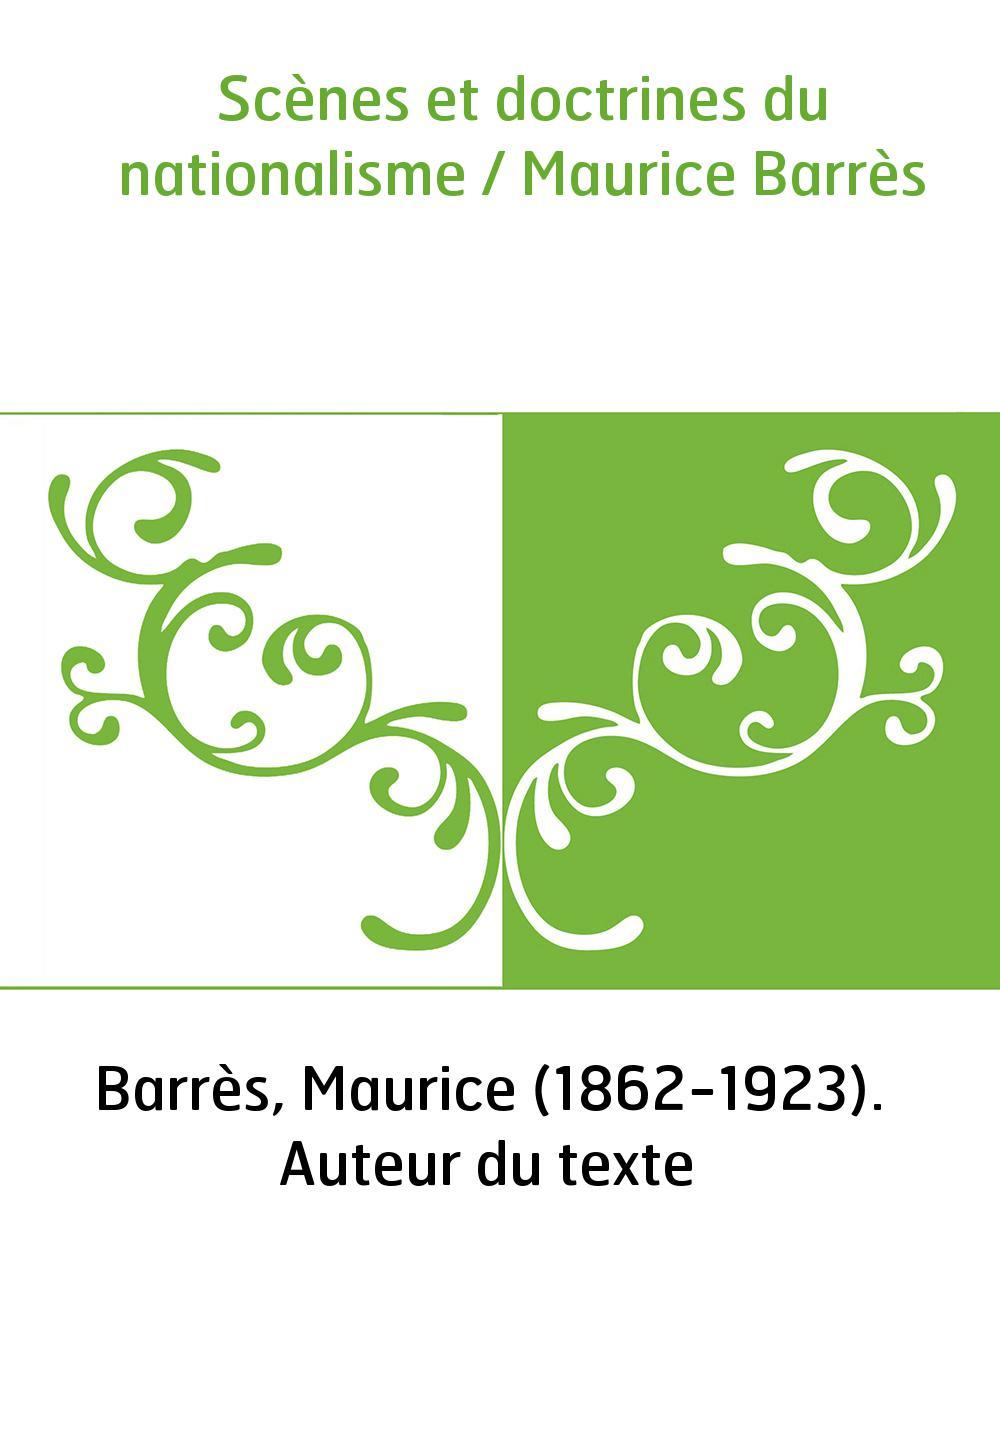 Scènes et doctrines du nationalisme / Maurice Barrès